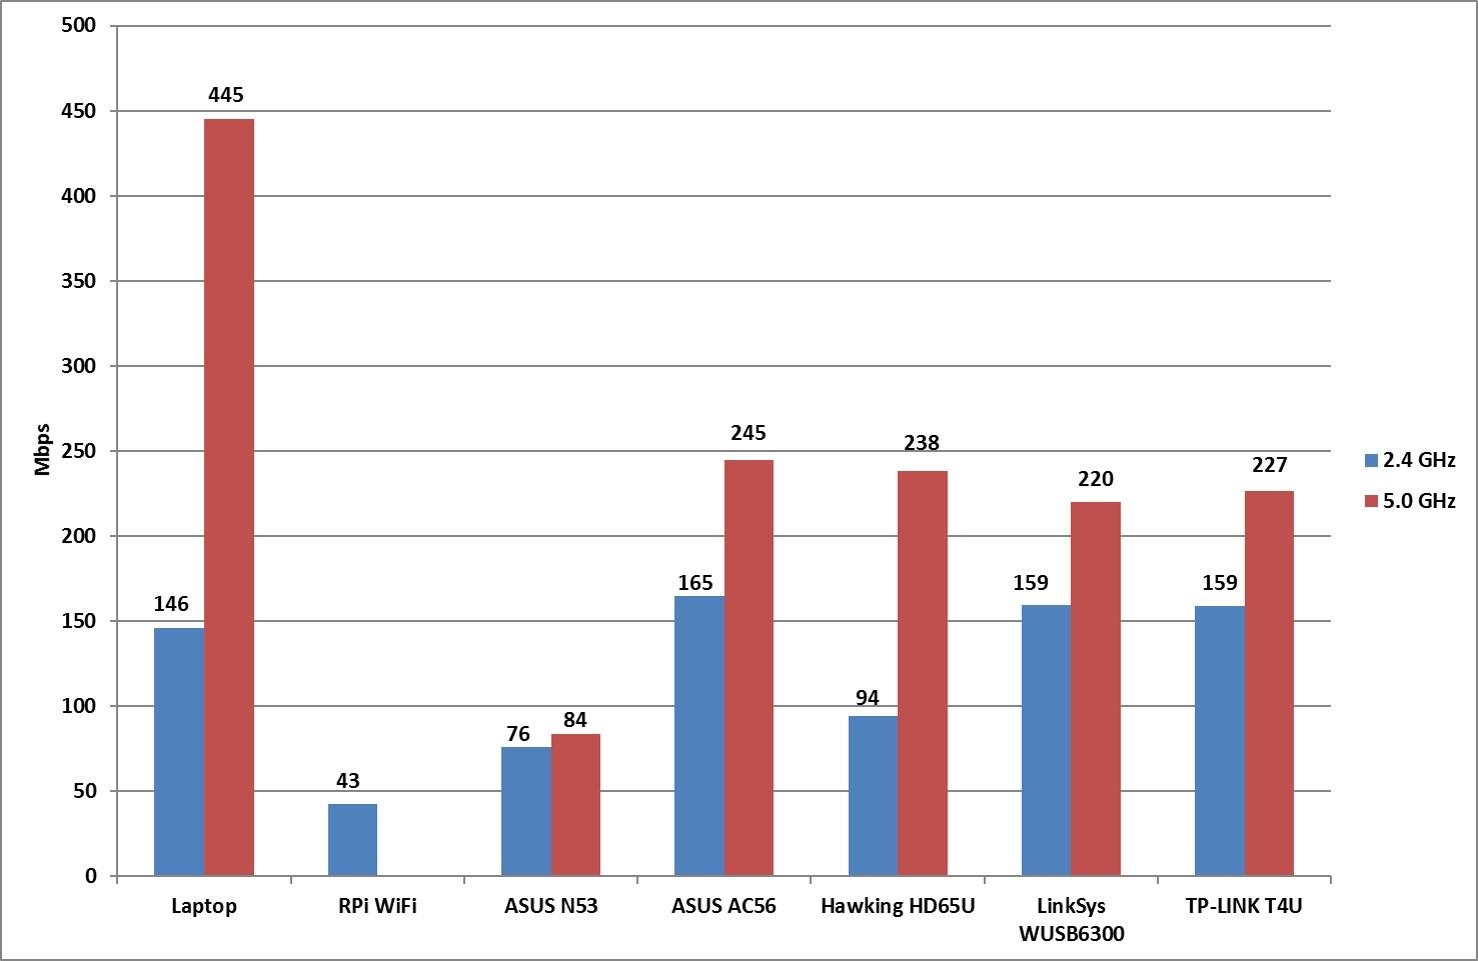 20160601 - Iperf WiFi Comparison on Raspberry Pi (LOS)